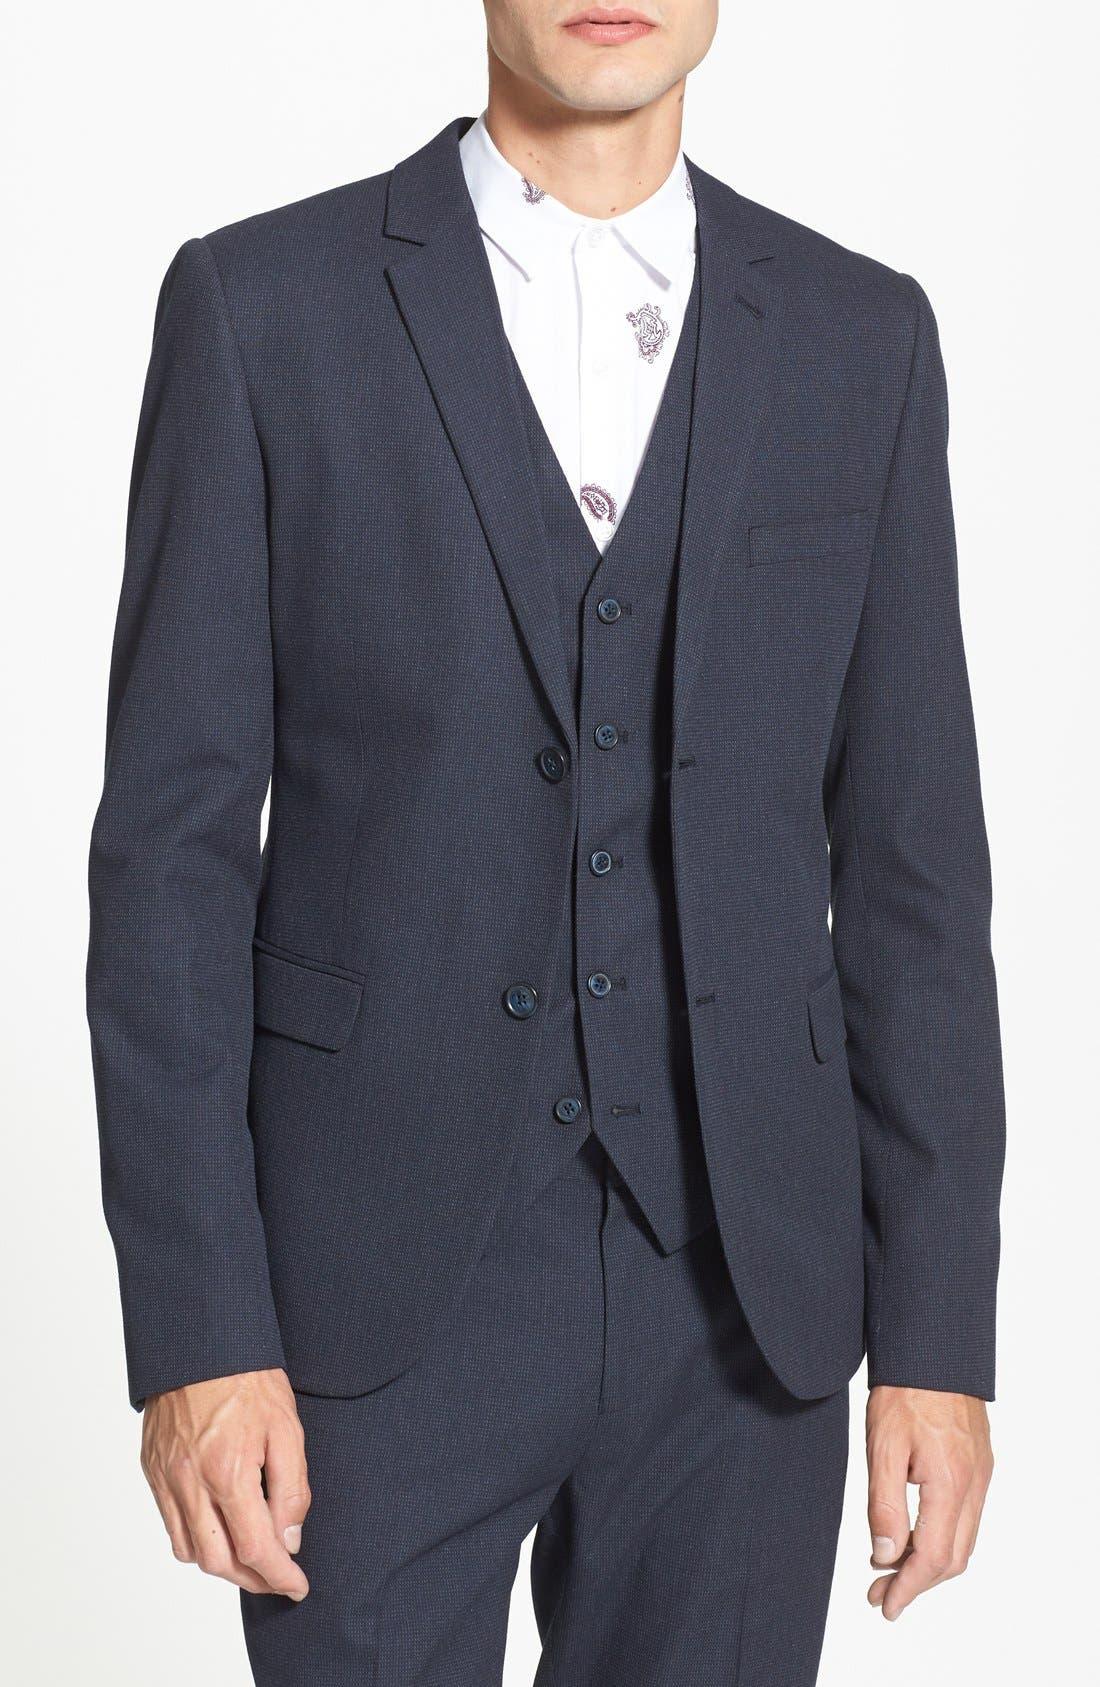 Main Image - Topman Navy Pin Dot Skinny Fit Suit Jacket